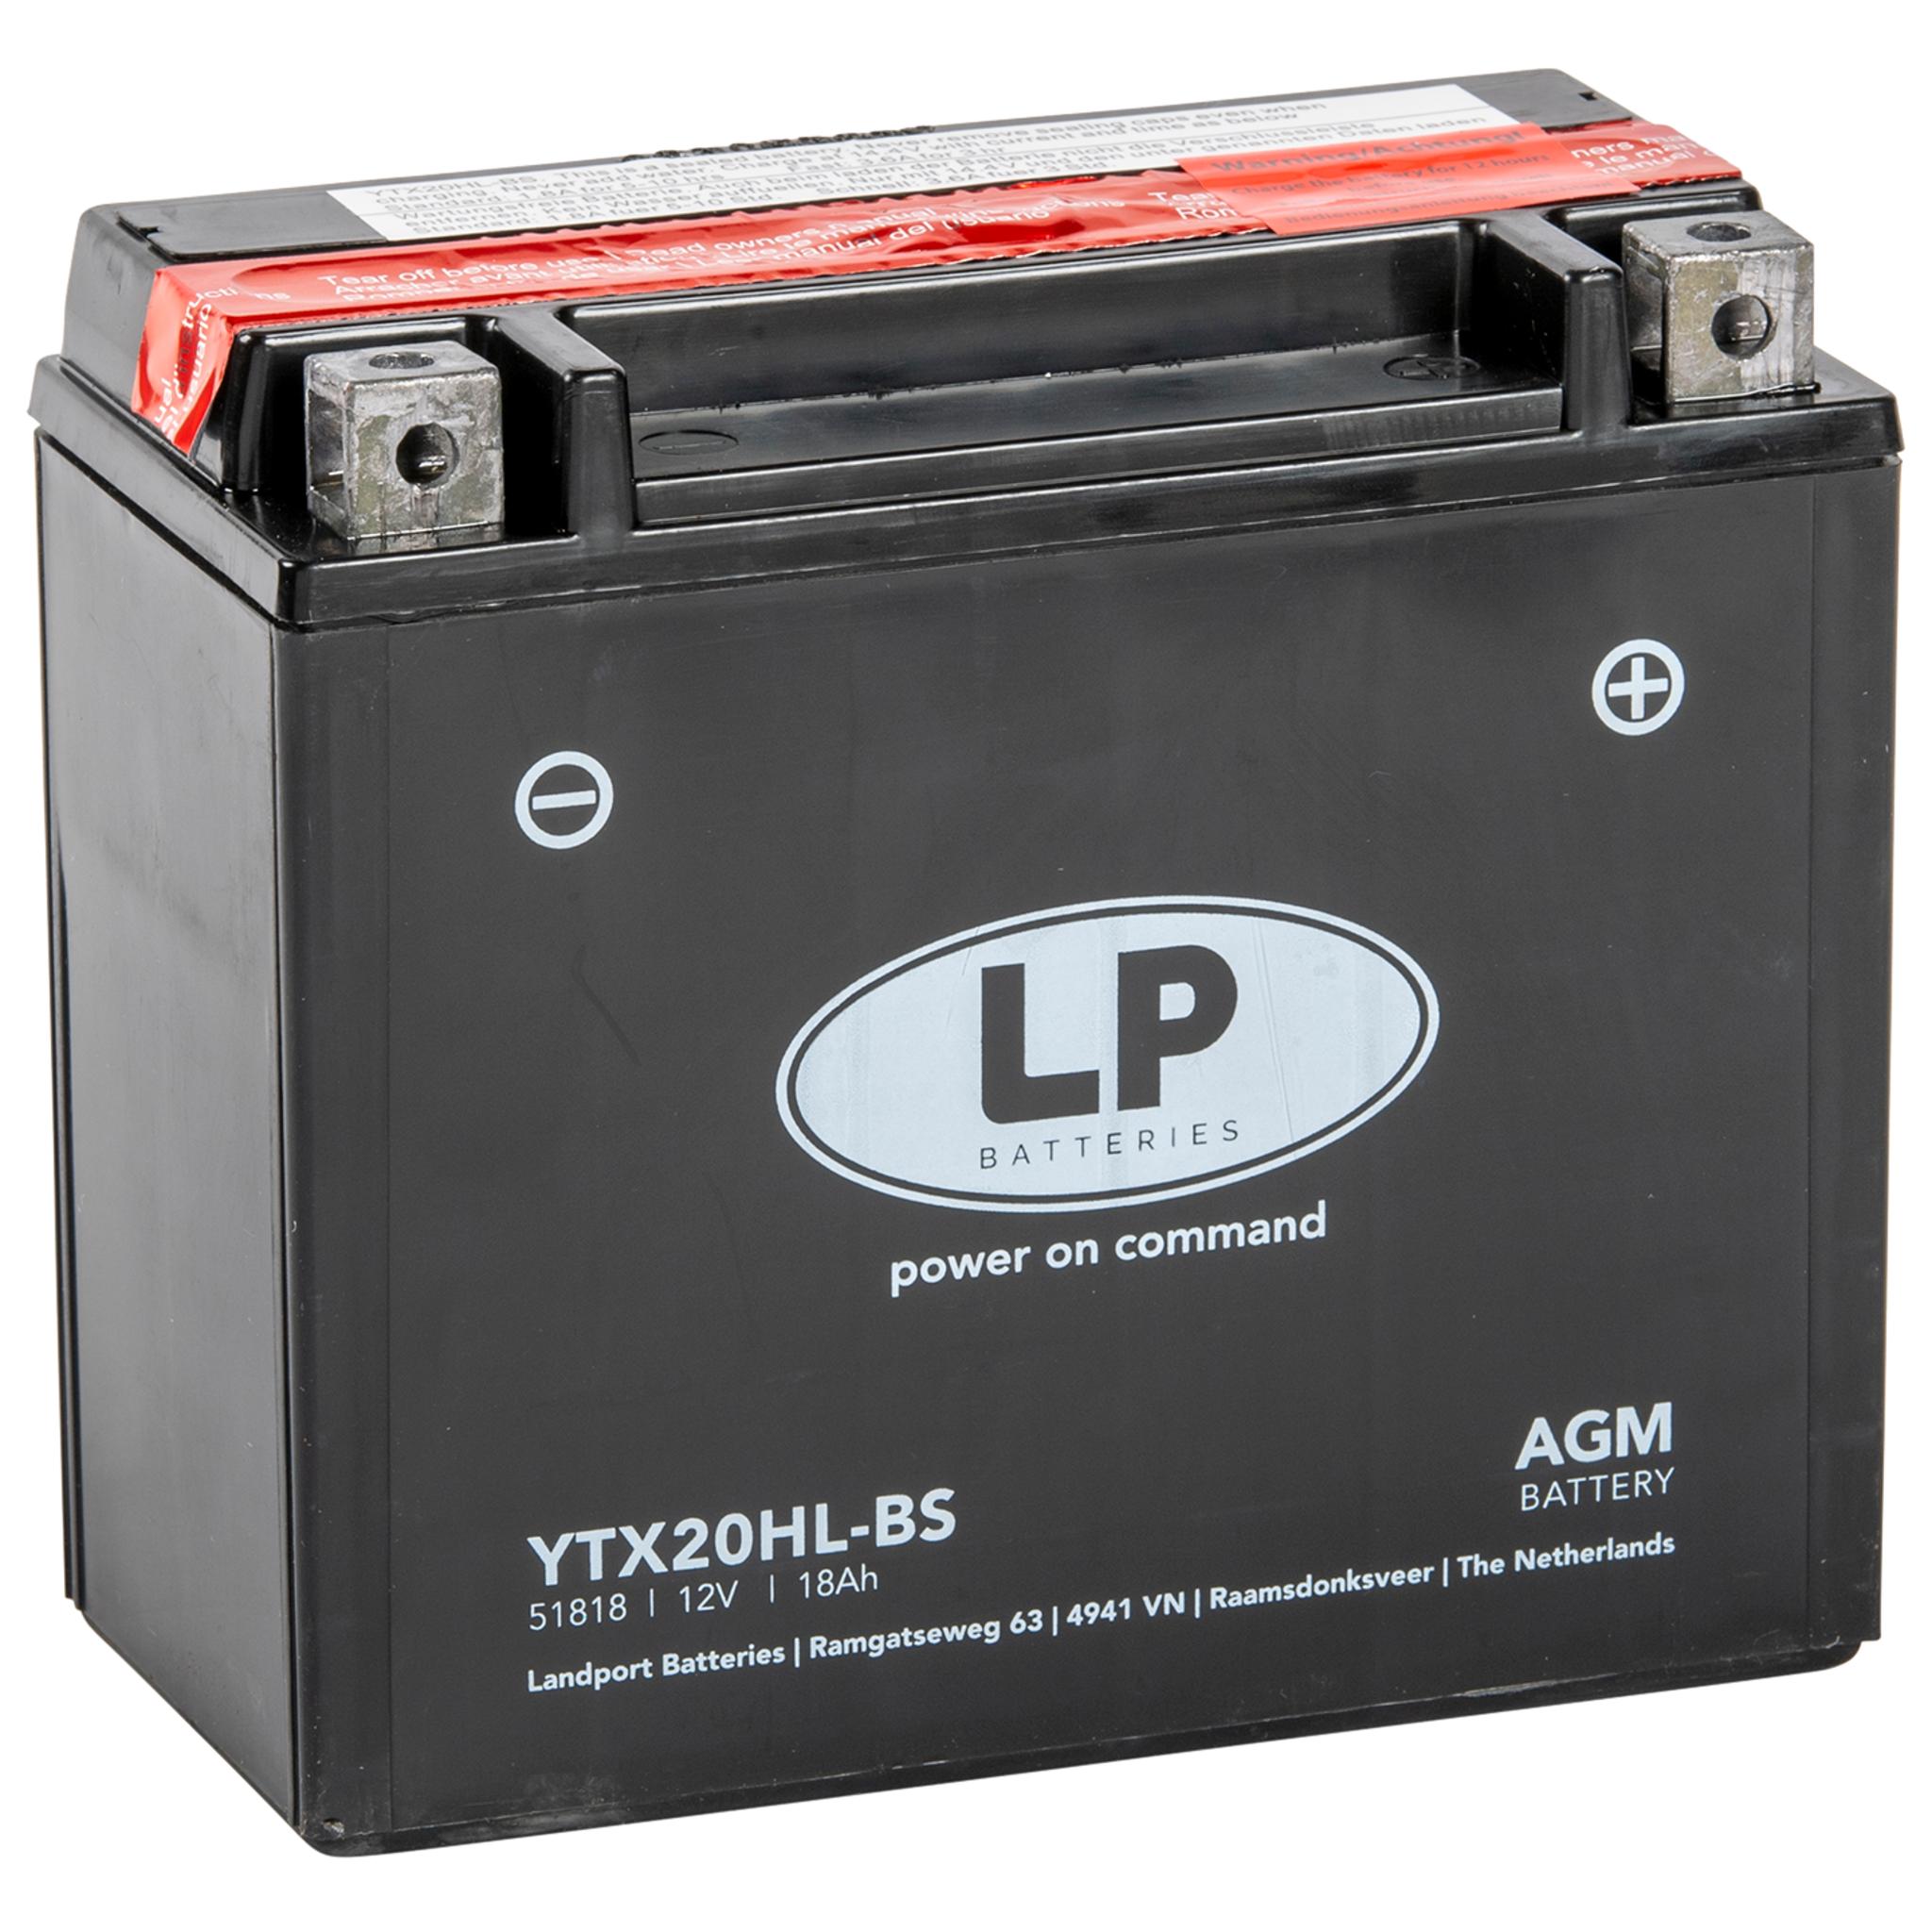 Аккумулятор Landport YTX20HL-BS, 12V, AGM